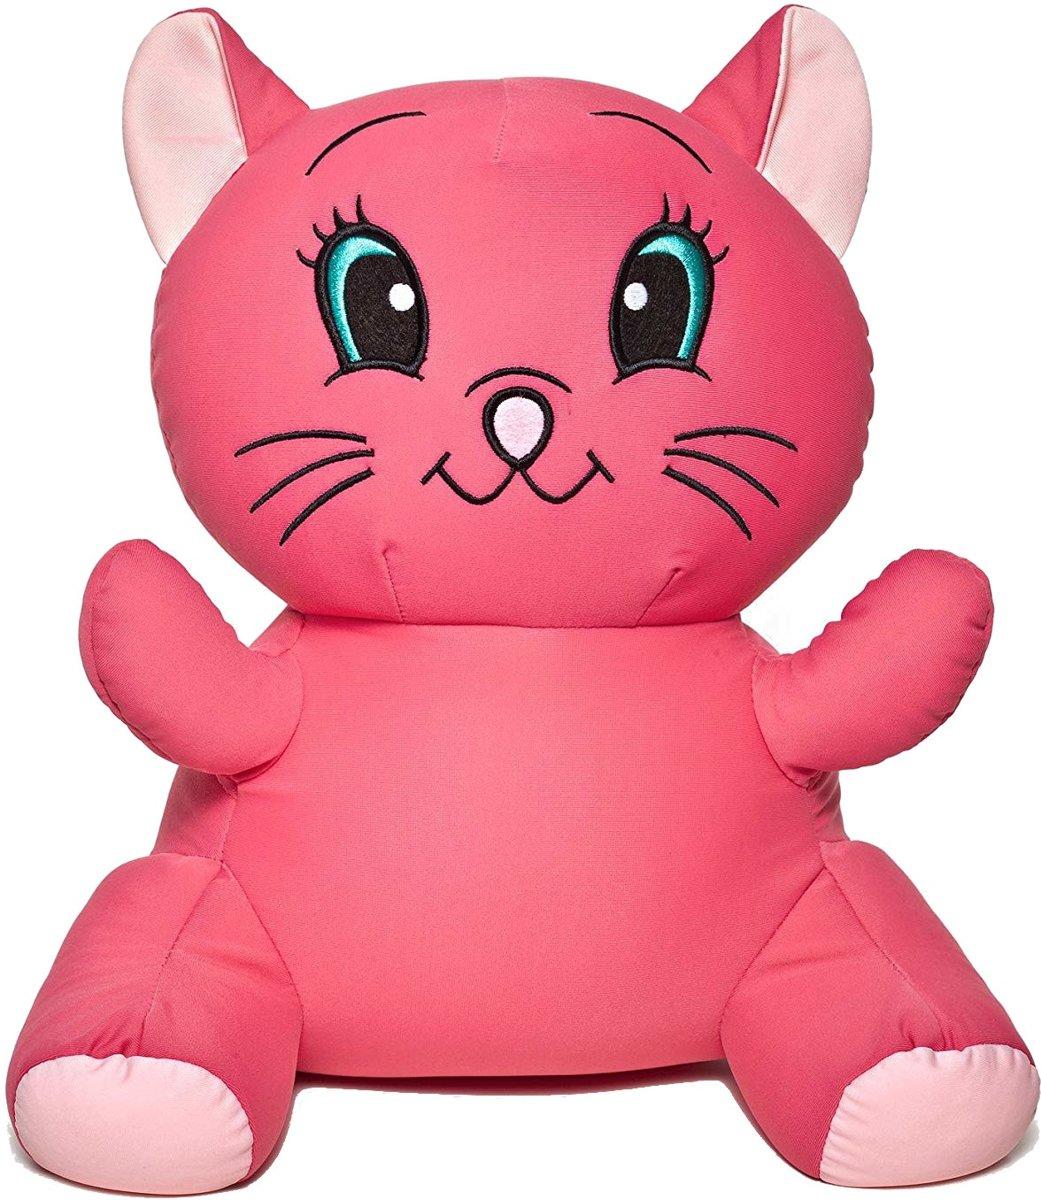 Cuddlebug Cat kussen kopen